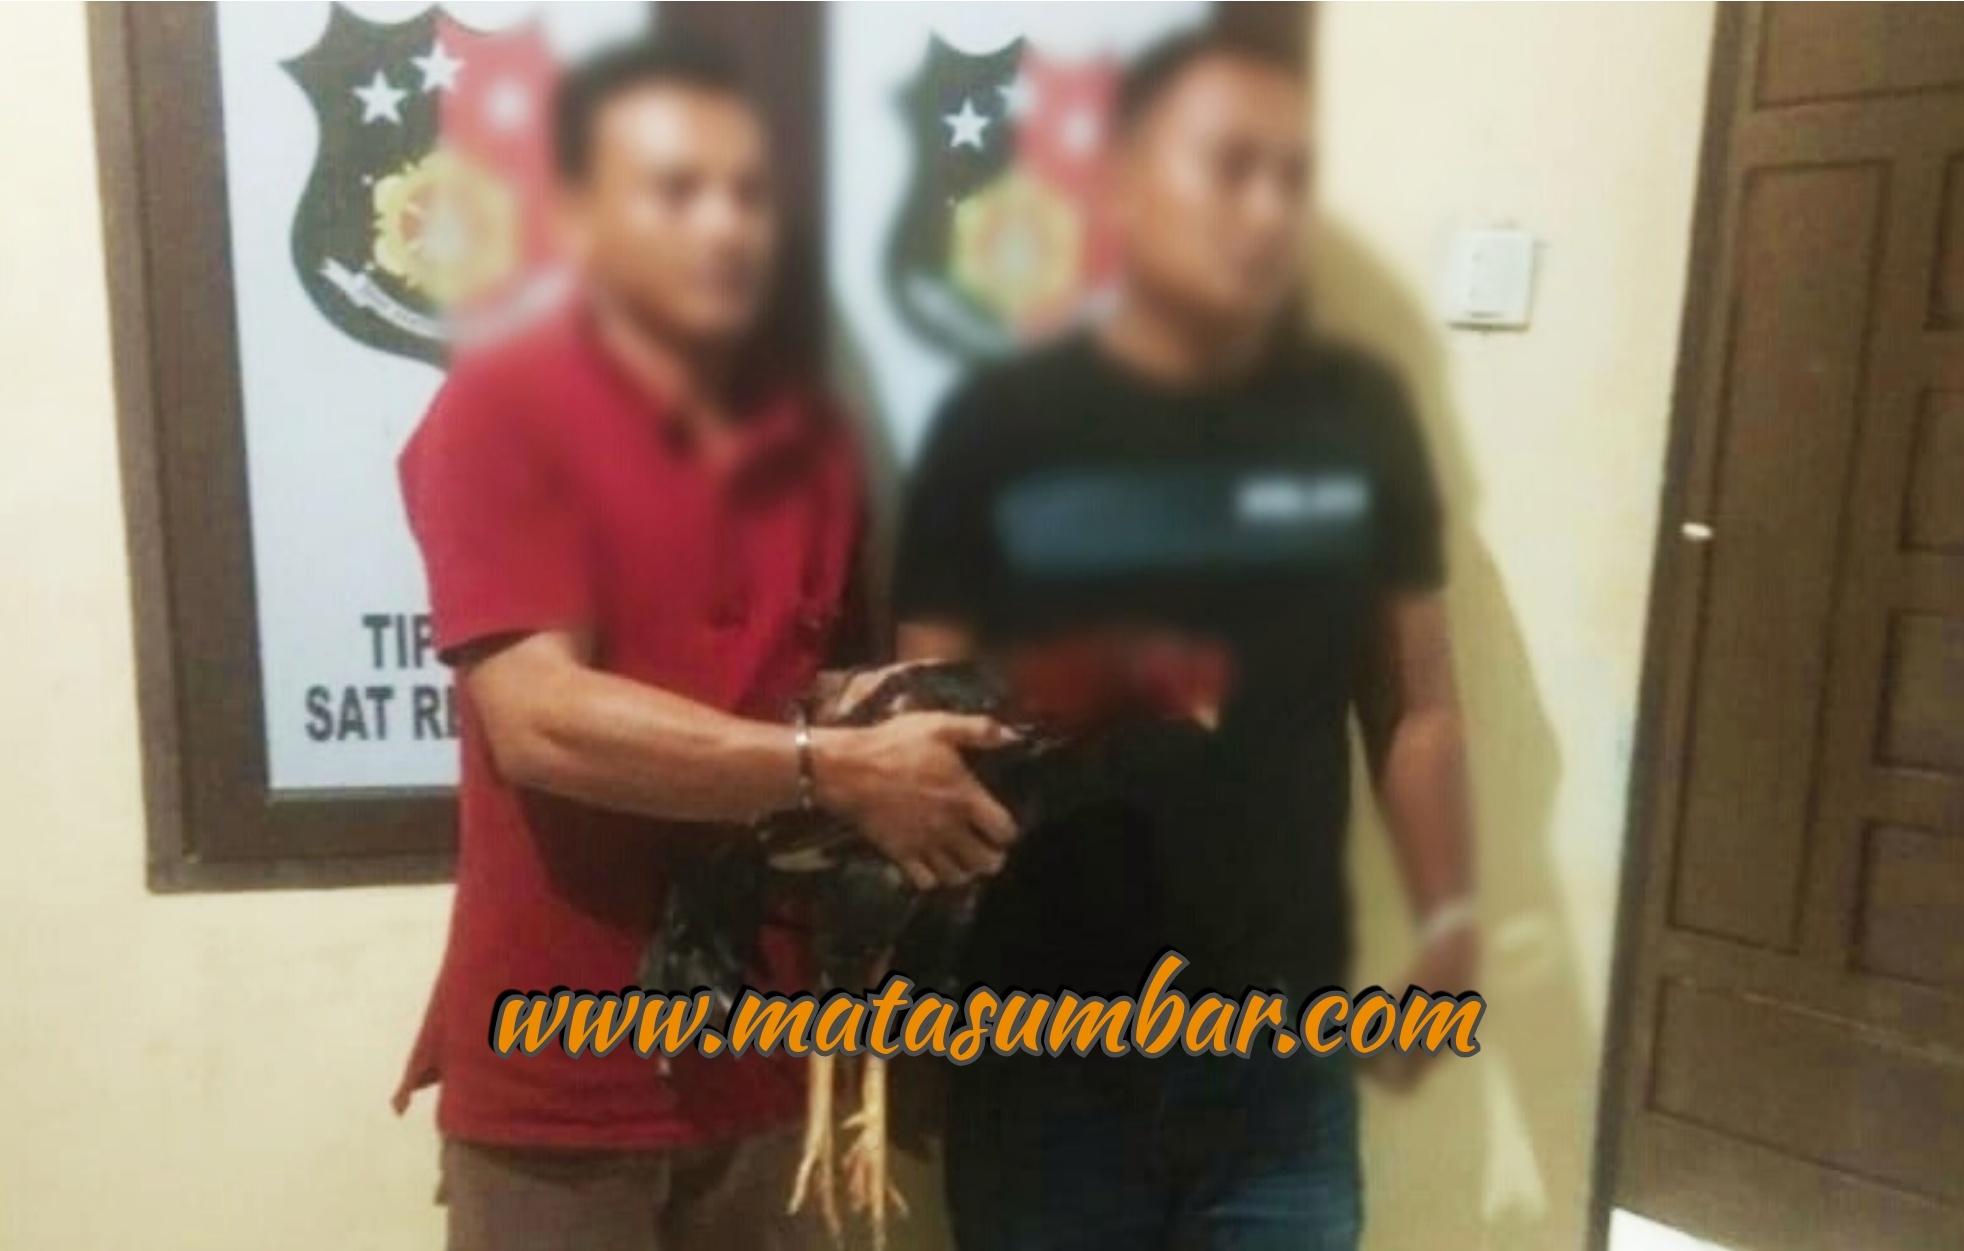 Sat Reskrim Polres Pasbar Tangkap Dua Pelaku Judi Sabung Ayam